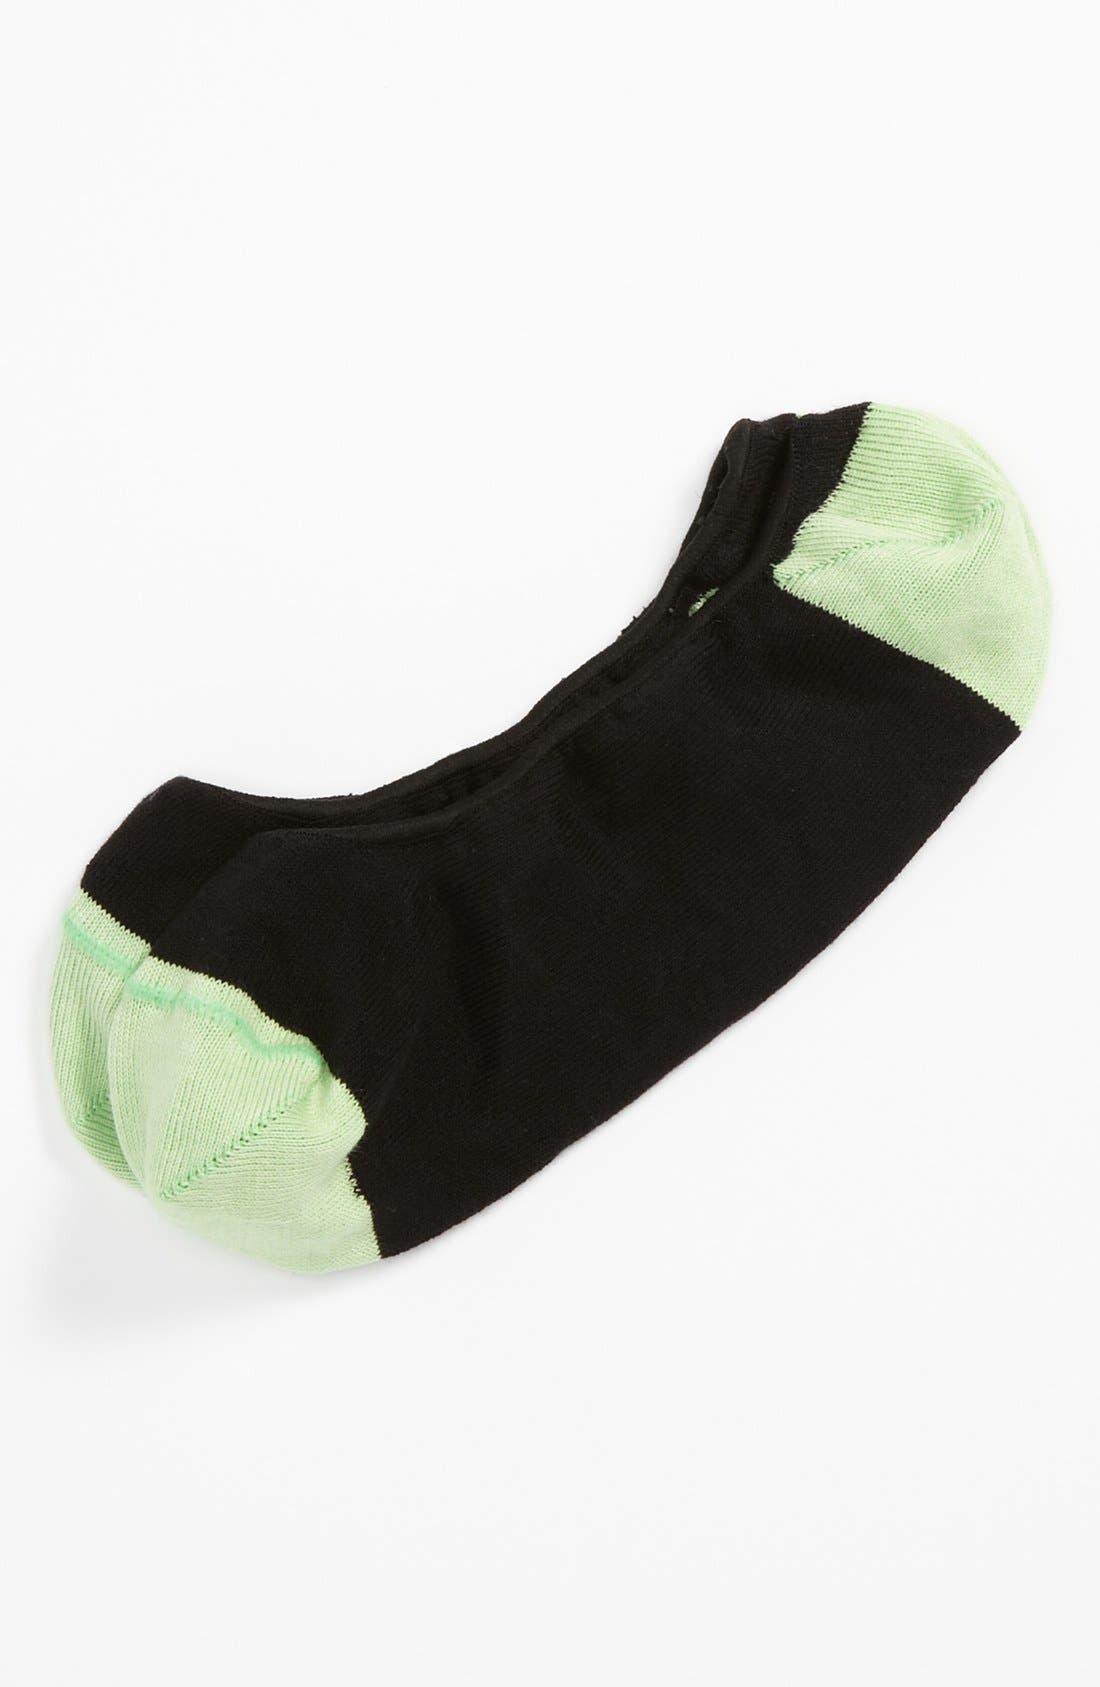 HOOK + ALBERT Loafer Socks, Main, color, 001